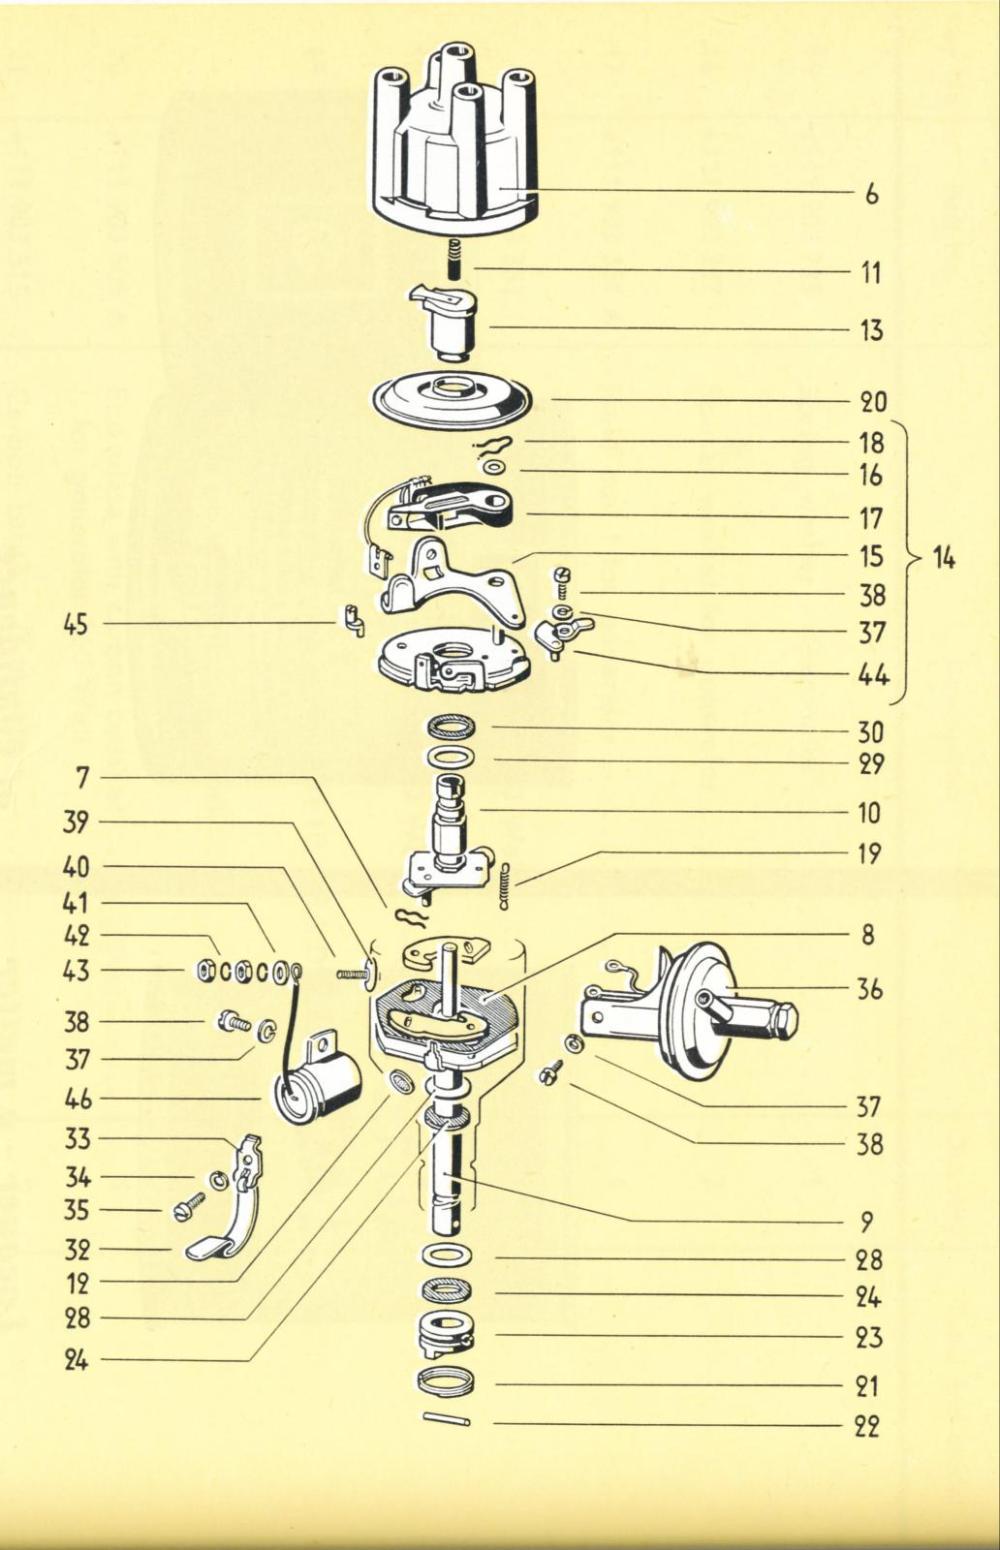 medium resolution of vw distributor diagram wiring diagram third level electronic ignition diagram of a vw beetle vw distributor diagram